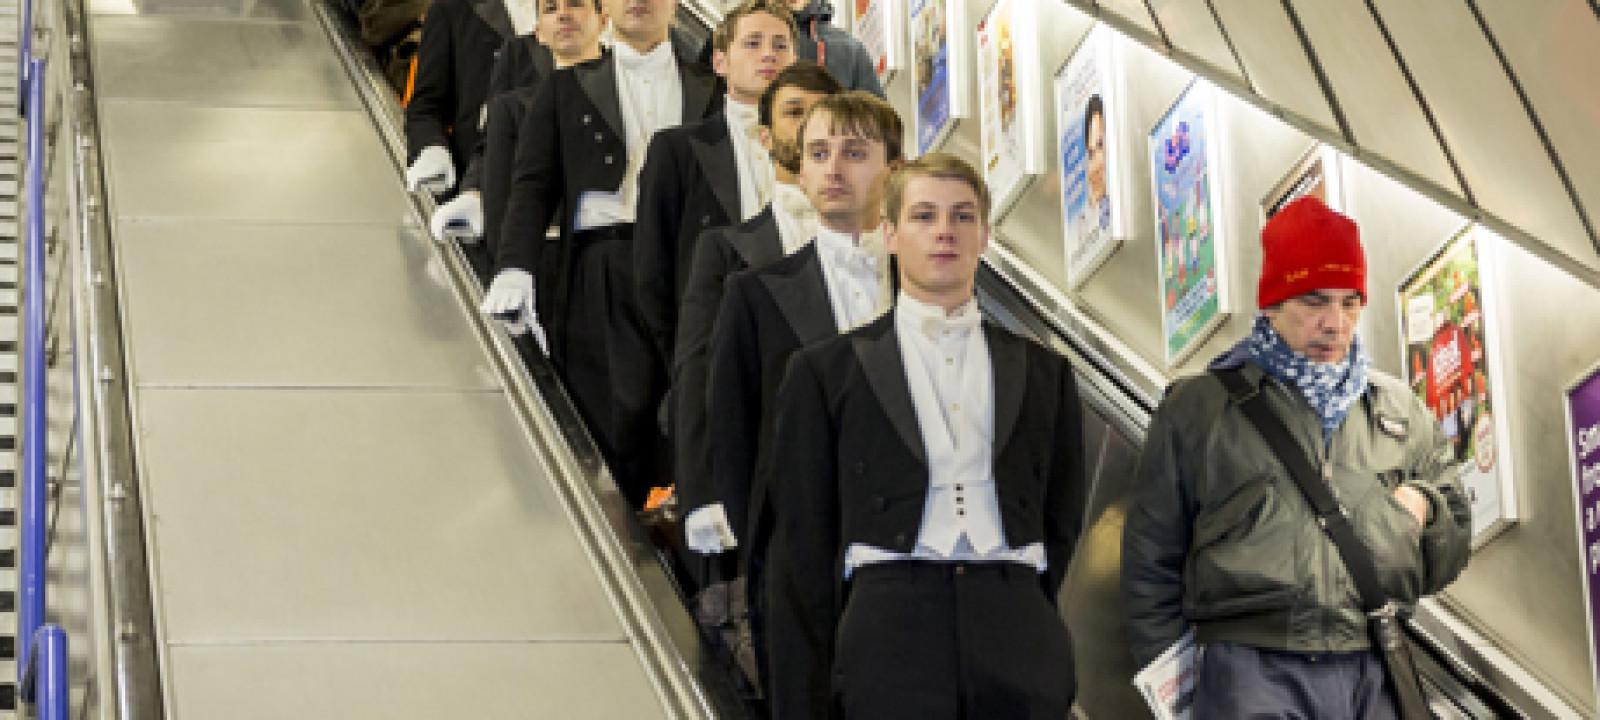 'Downton Abbey' DVD Launch, London, Britain – 13 Nov 2013